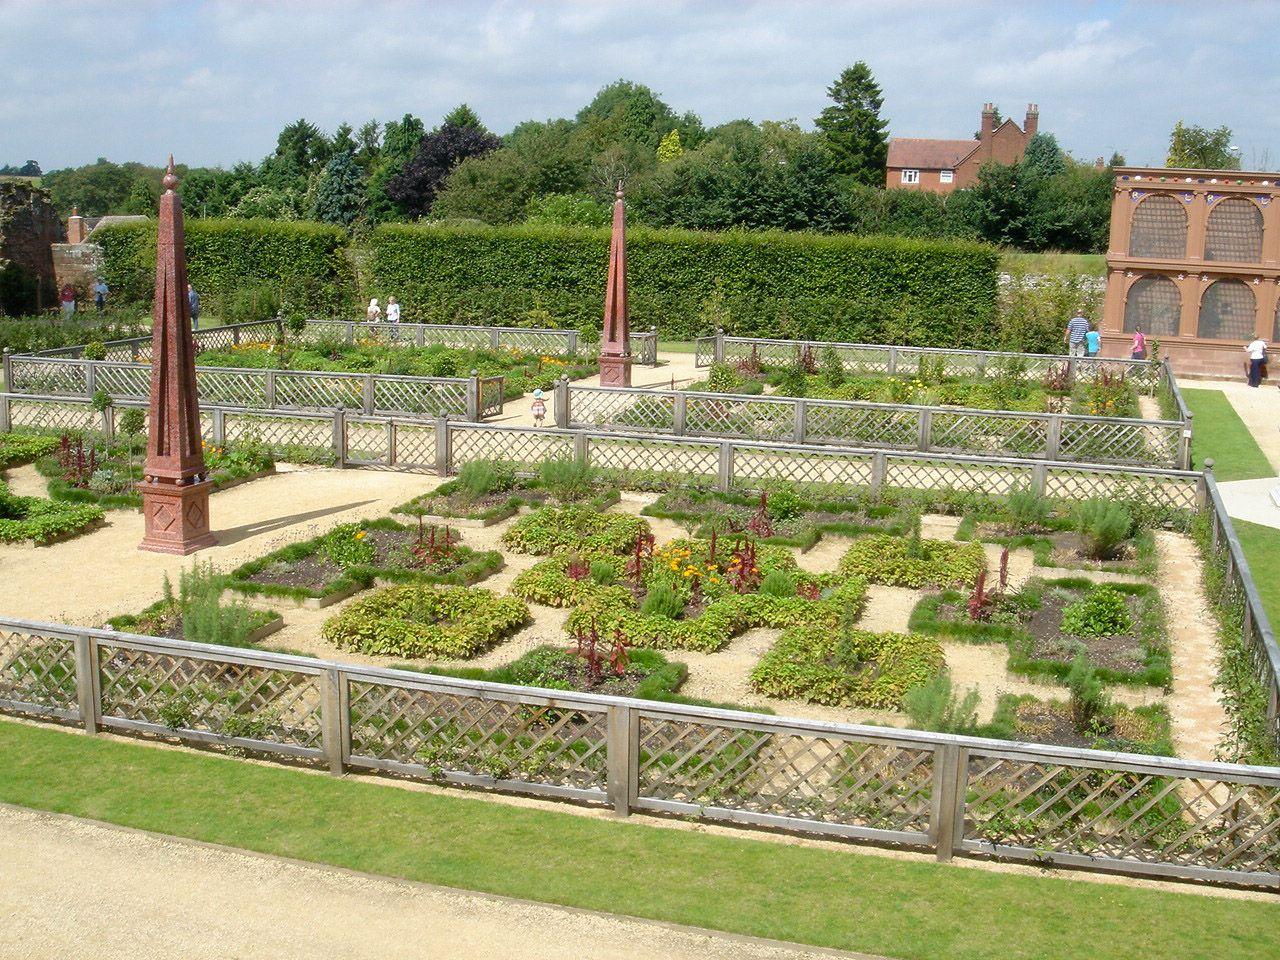 Pin By Justin Mcleod On Landscape Formal Design Garden History Kenilworth Castle Kenilworth